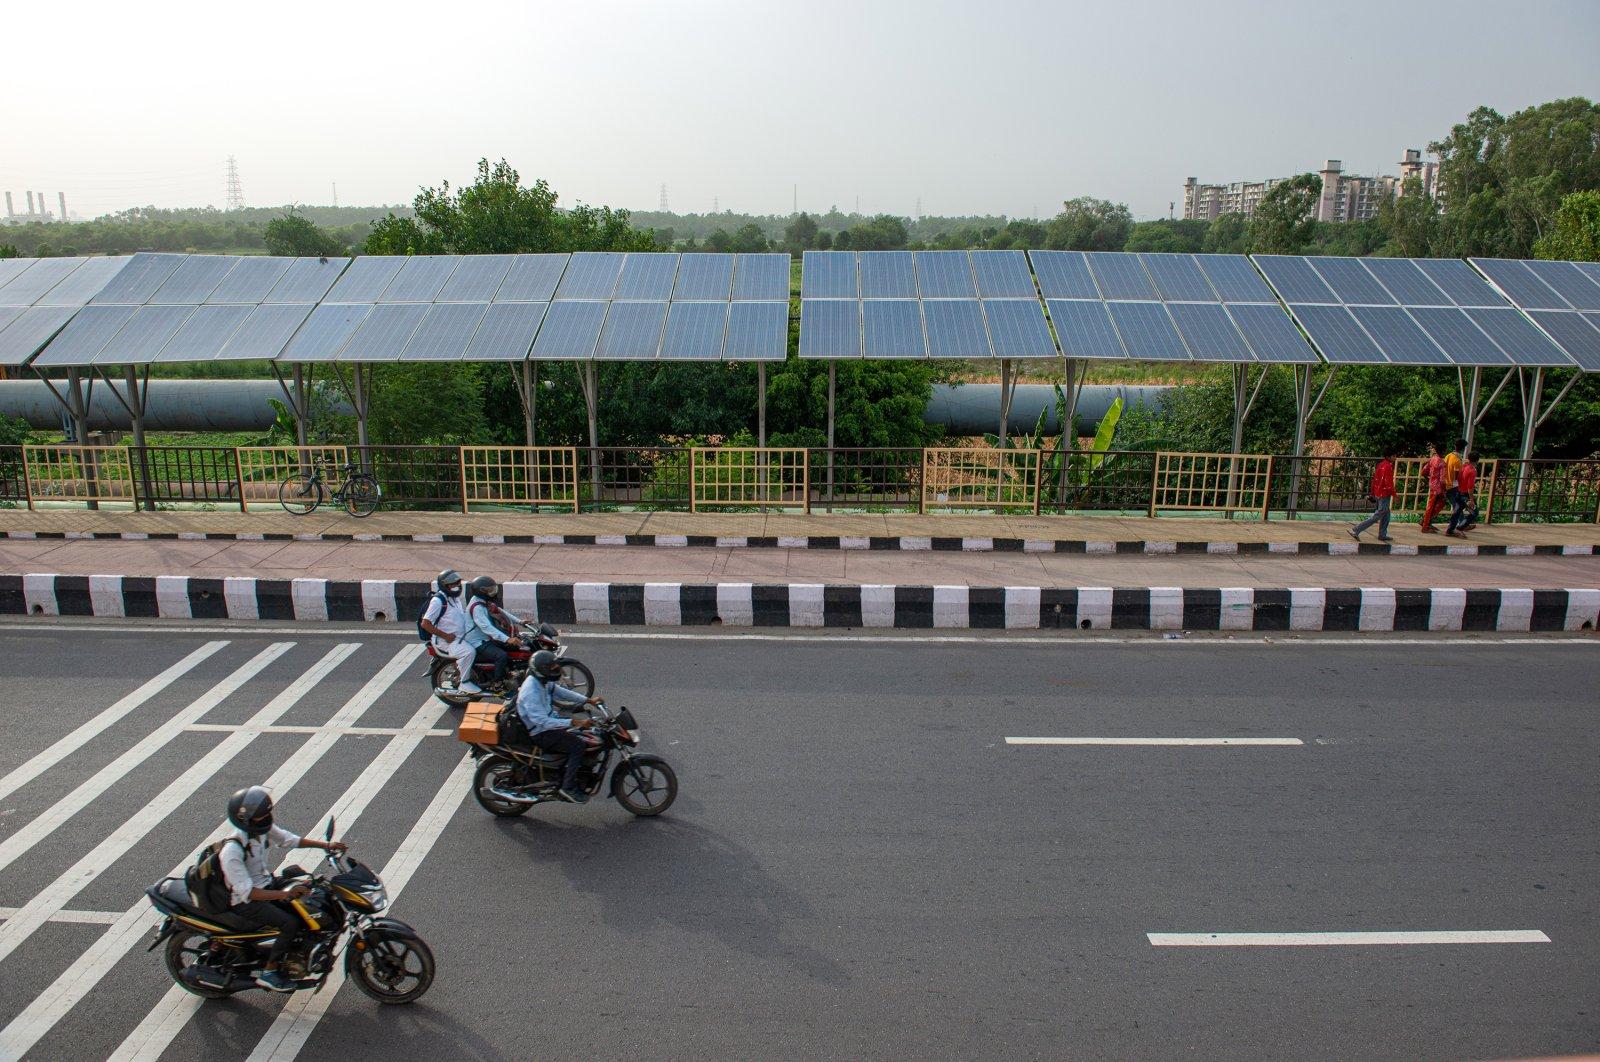 Bikers pass near solar panels installed on Delhi Meerut expressway, New Delhi, India, June 15, 2021. (Shutterstock Photo)